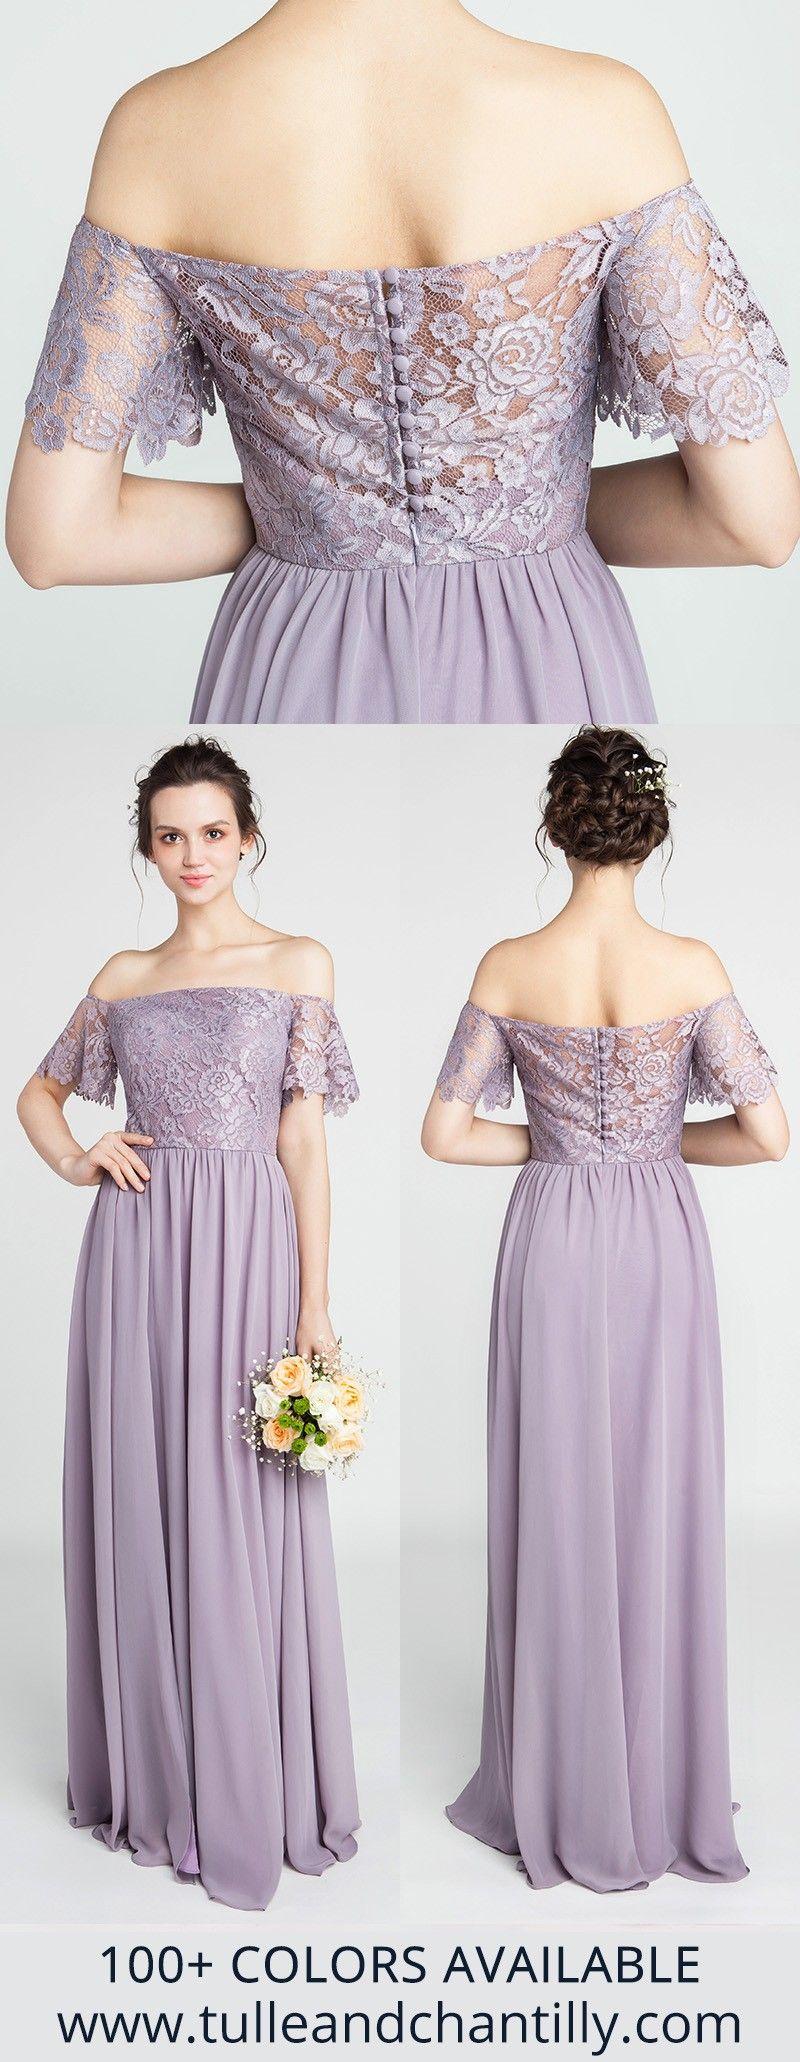 Gorgeous Lace Off The Shoulder Bridesmaid Gown With Chiffon Skirt Tbqp402 Off Shoulder Bridesmaid Dress Purple Bridesmaid Dresses Kids Bridesmaid Dress